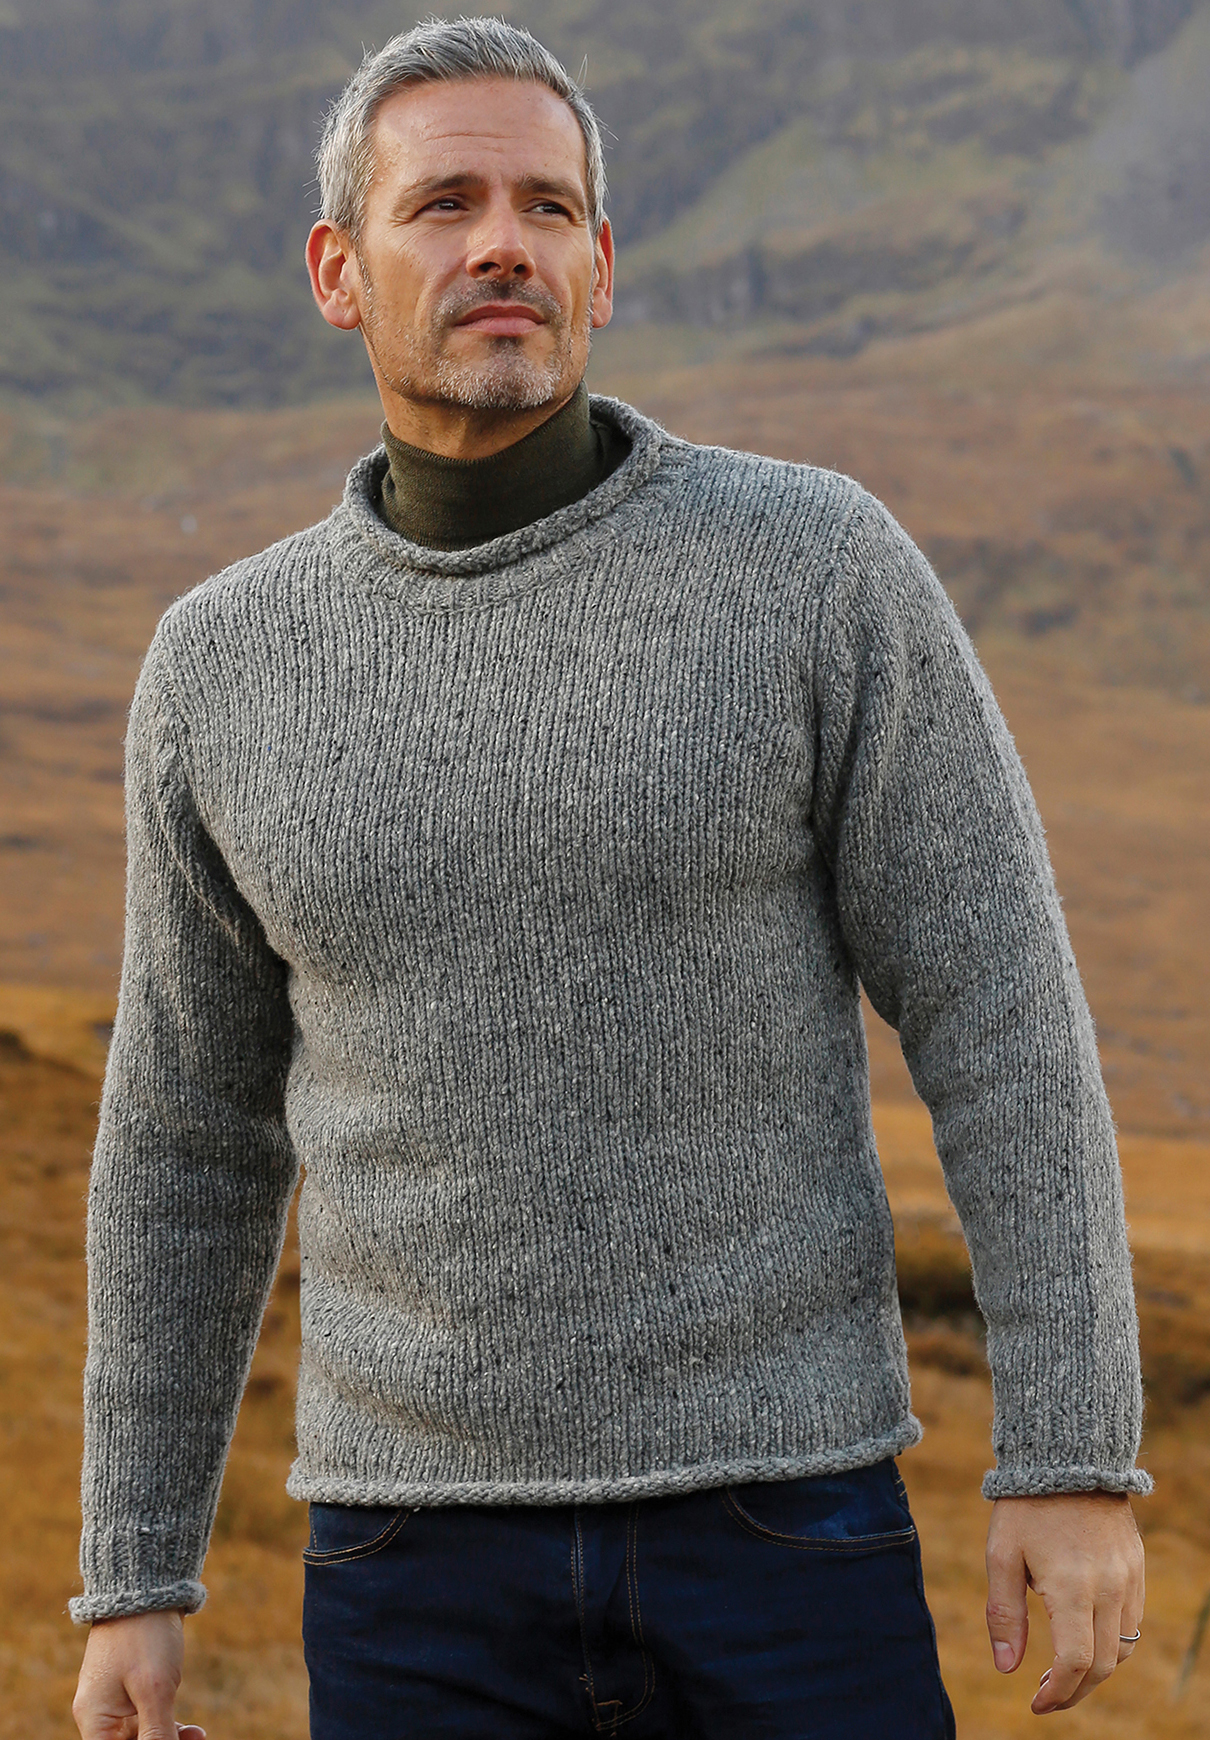 8f39378846ebc6 ... Carraig Donn Irish Aran Mens Wool Sweater Roll Collar Curl Neck Crew  Neck Crewneck Pullover Jumper